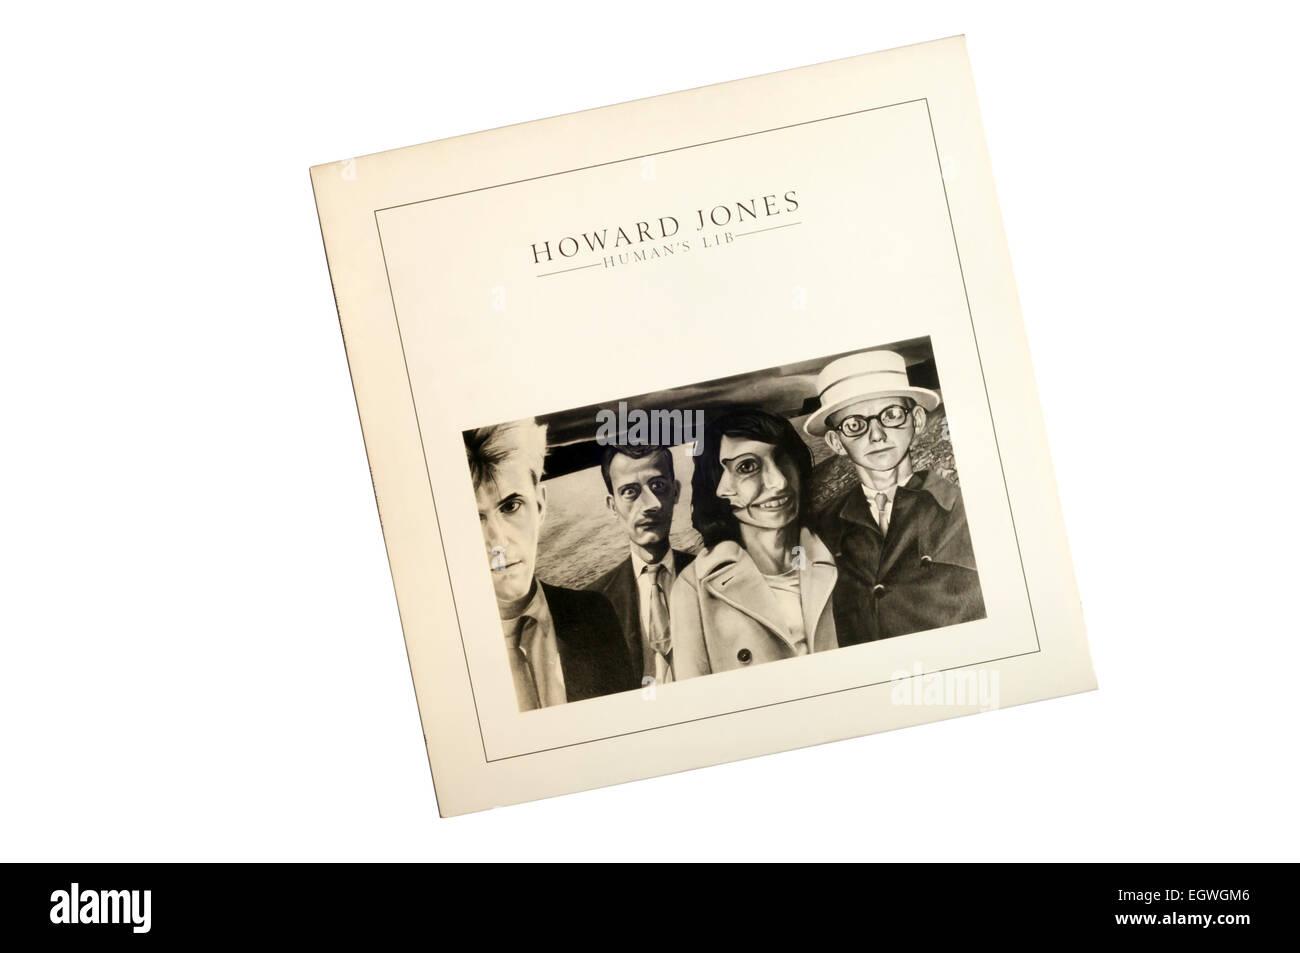 Human's Lib was the 1984 debut album by British pop musician Howard Jones. - Stock Image